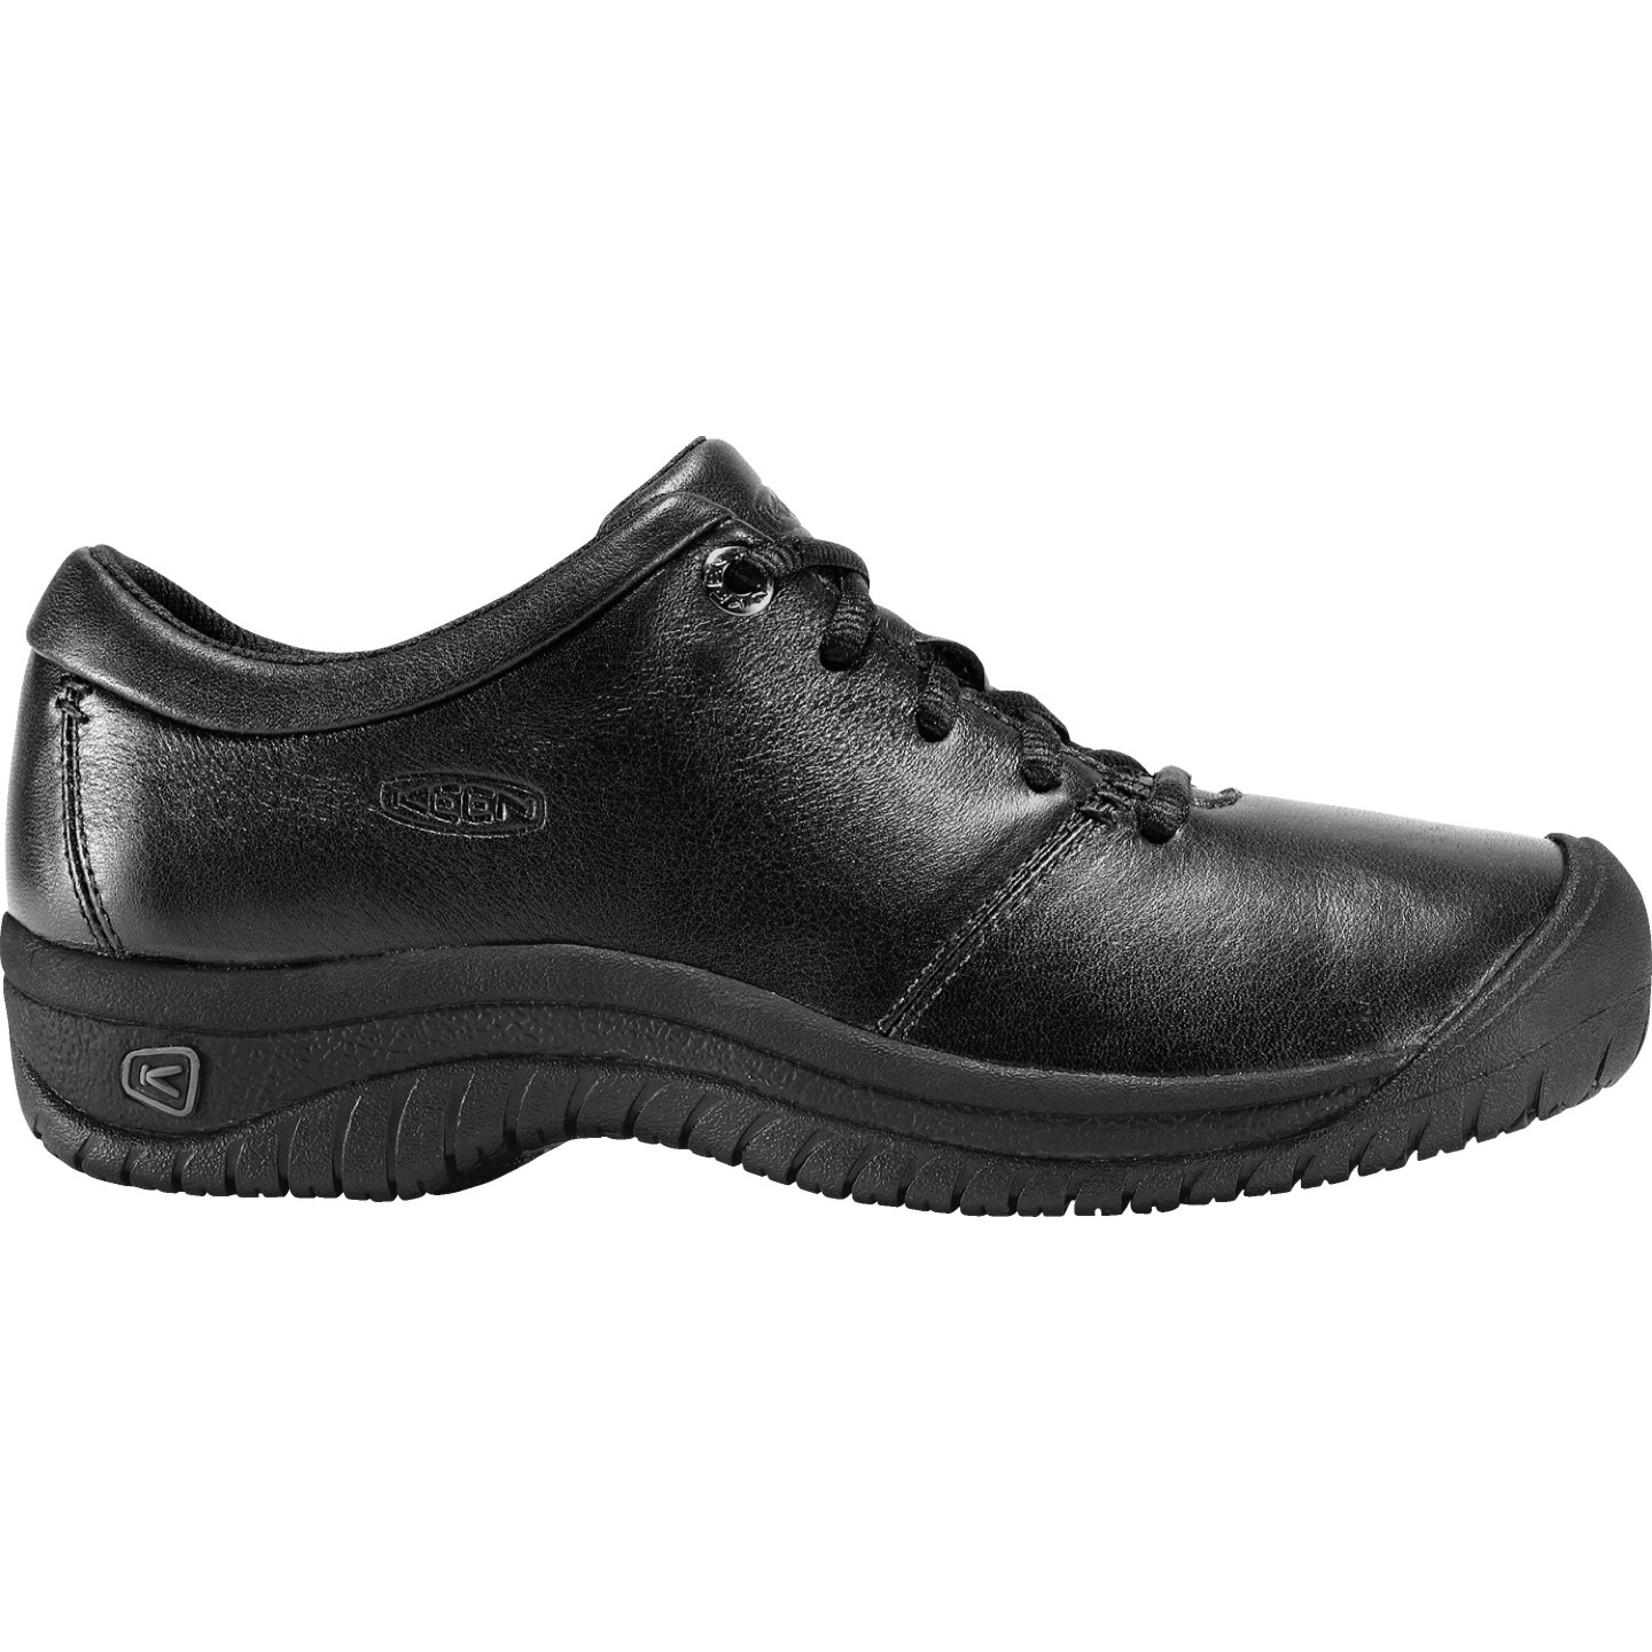 Keen Women's Keen Work Shoe Soft Toe PTC Black 1006999